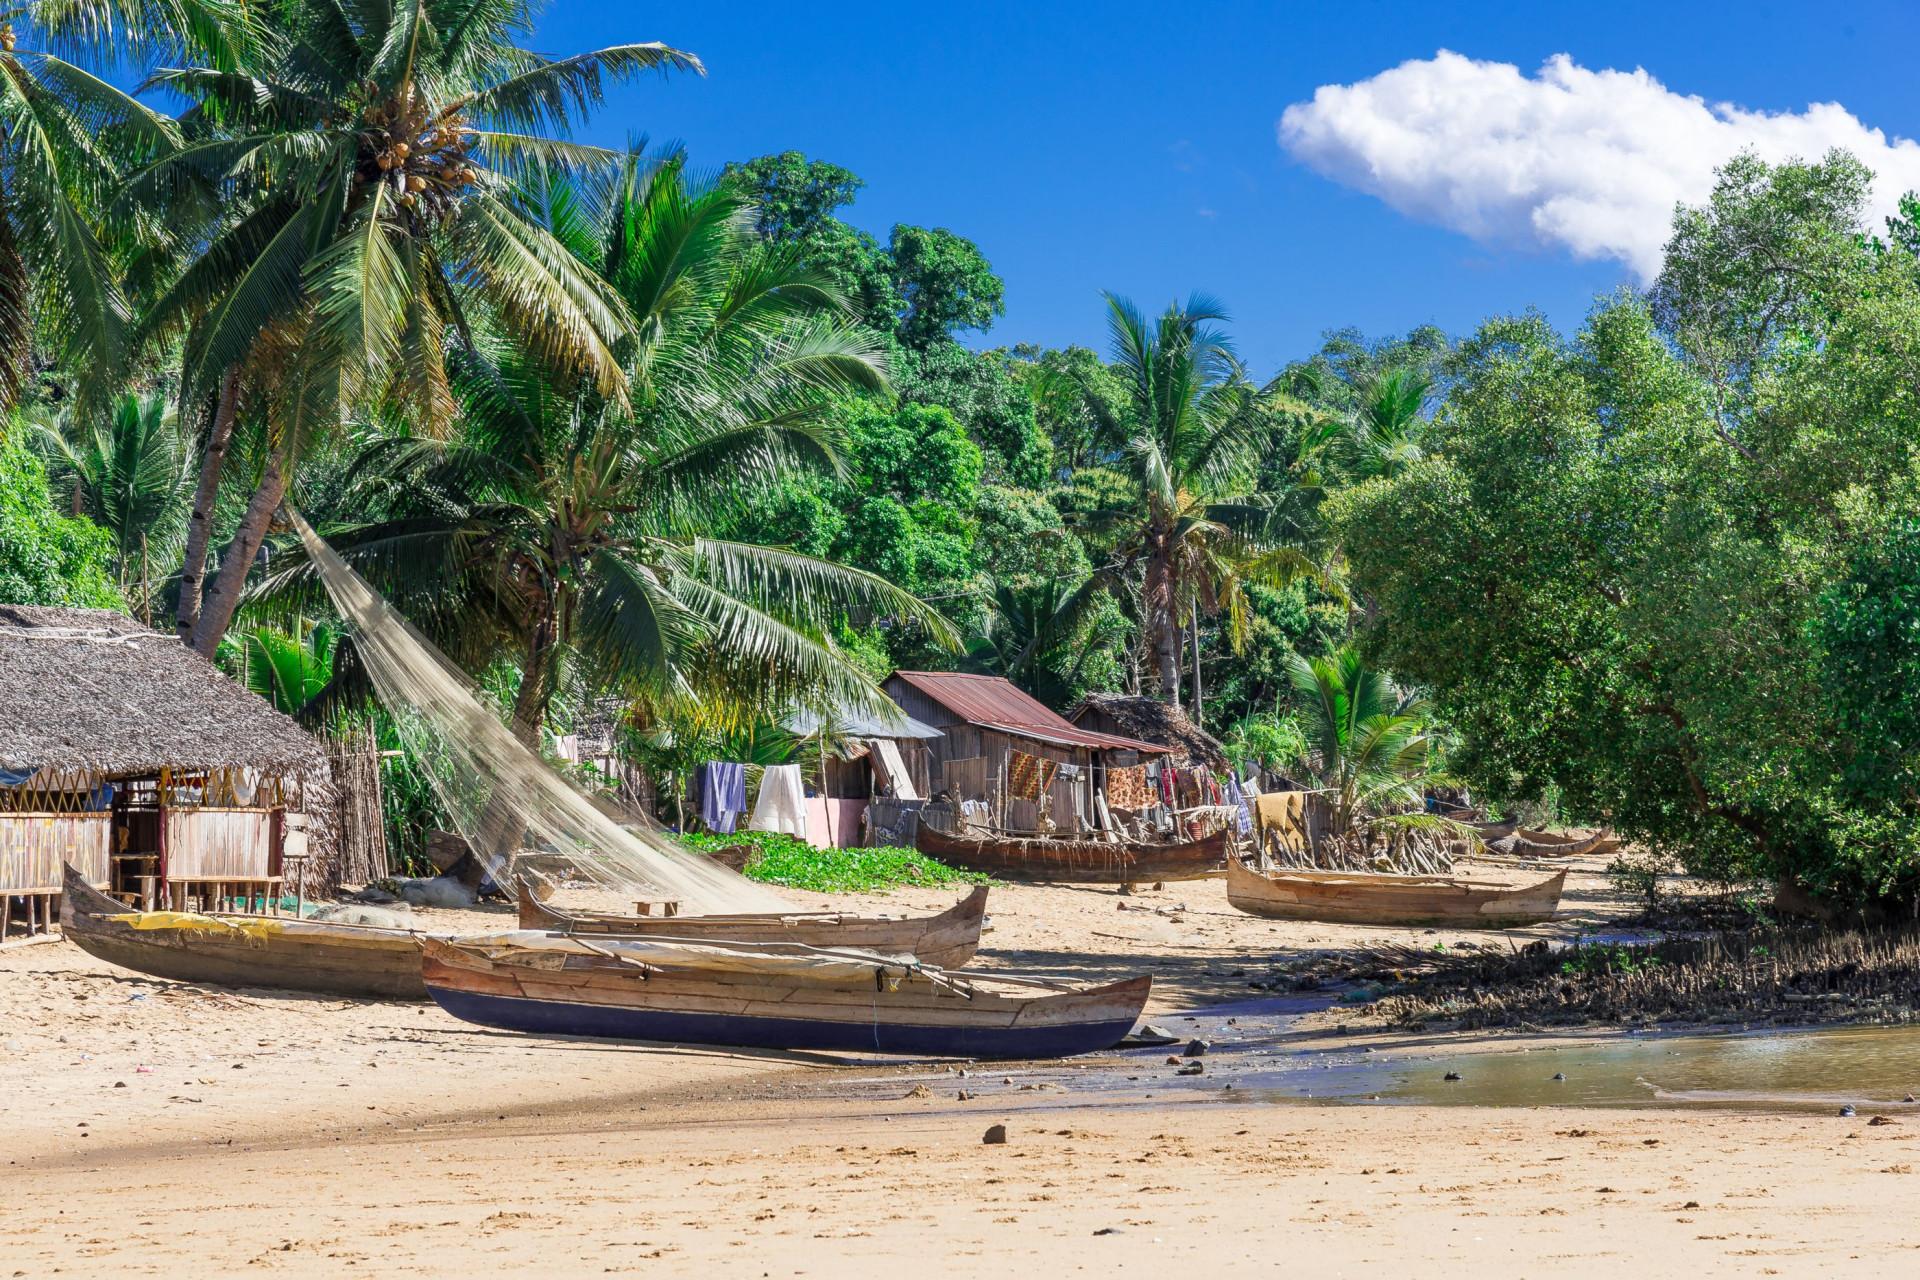 Deixe-se deslumbrar pelos mais belos arquipélagos africanos